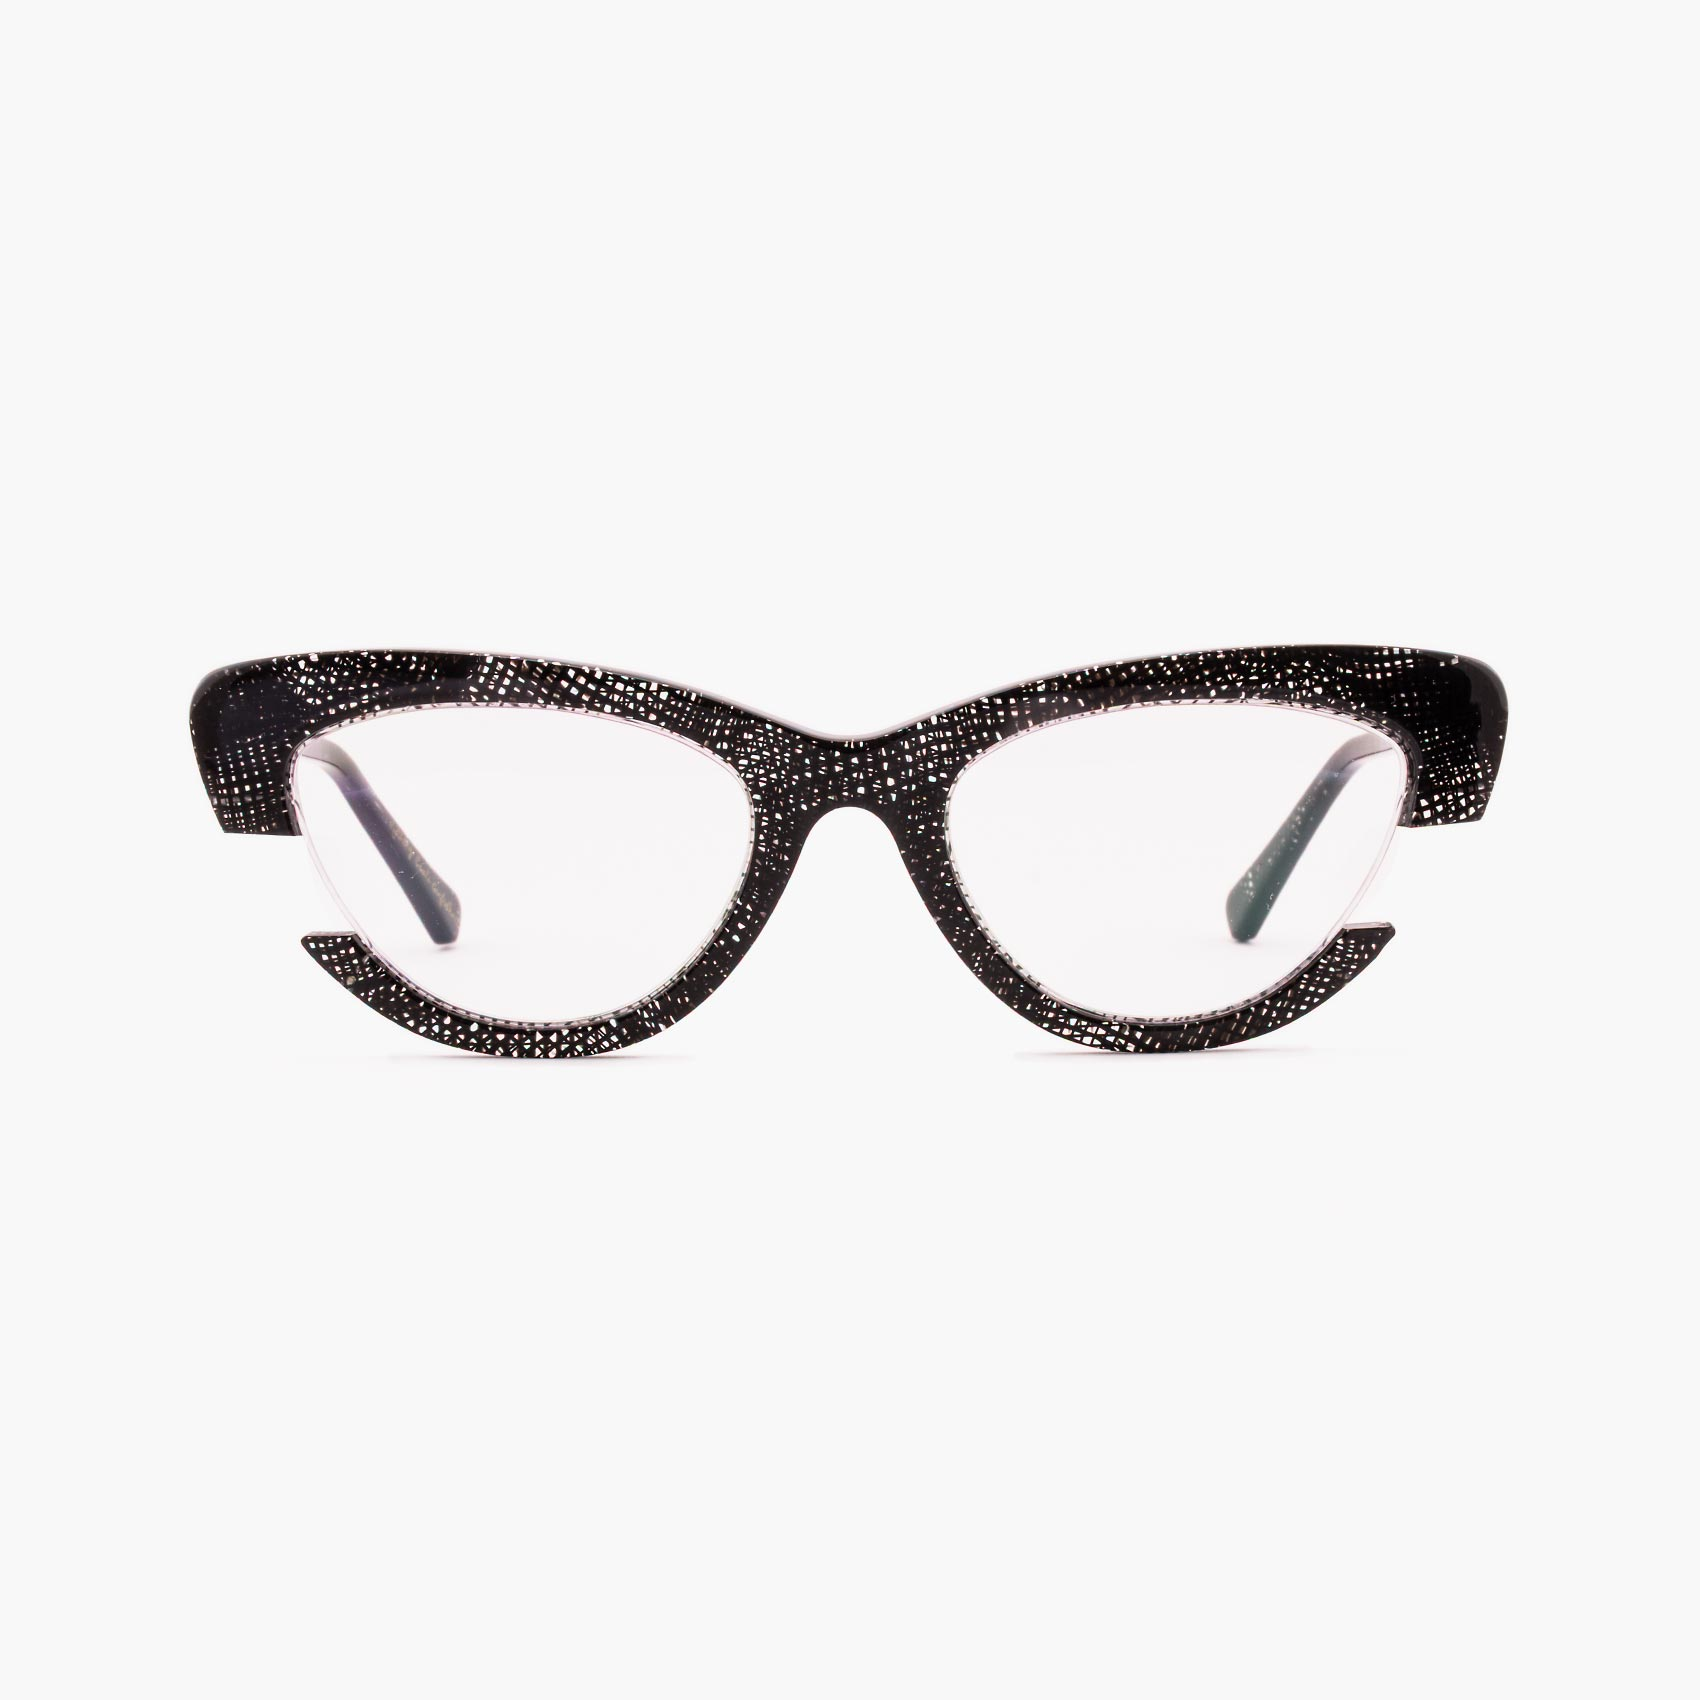 Gafas graduadas para mujer Proud eyewear modelo Jennifer